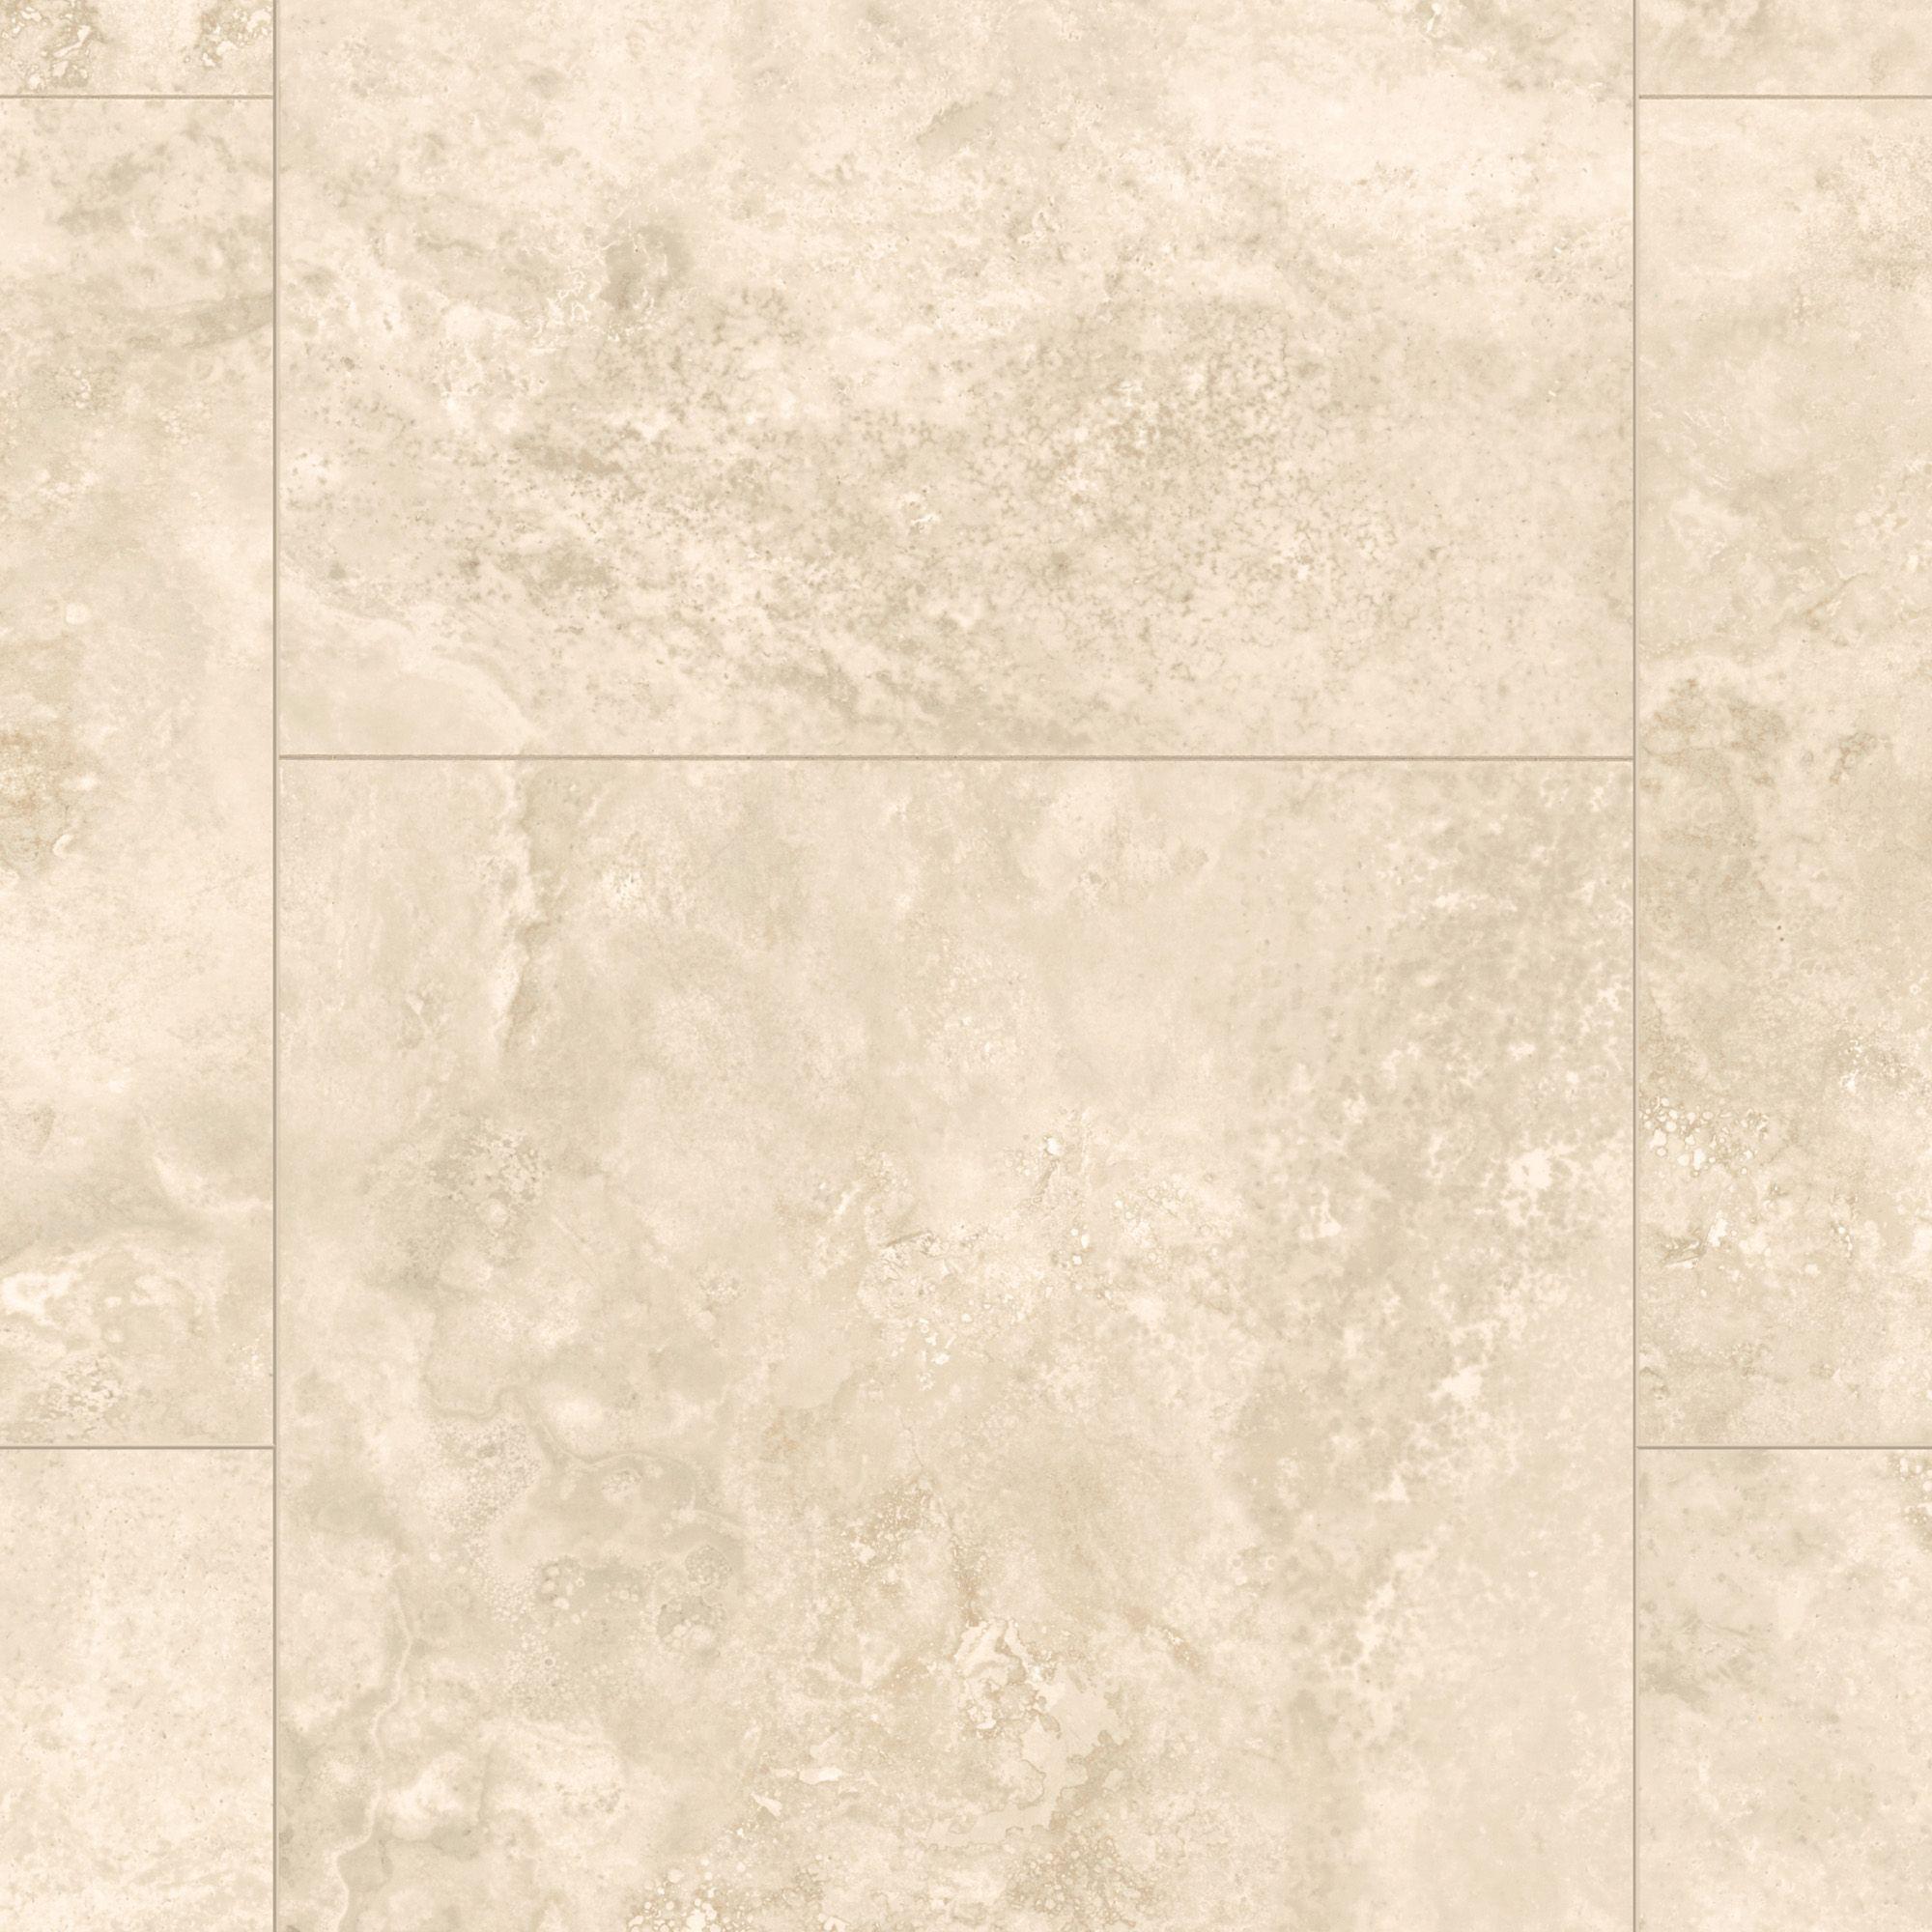 Quickstep Tila Natural Travertine Tile Effect Laminate Flooring Sample Departments Diy At B Q